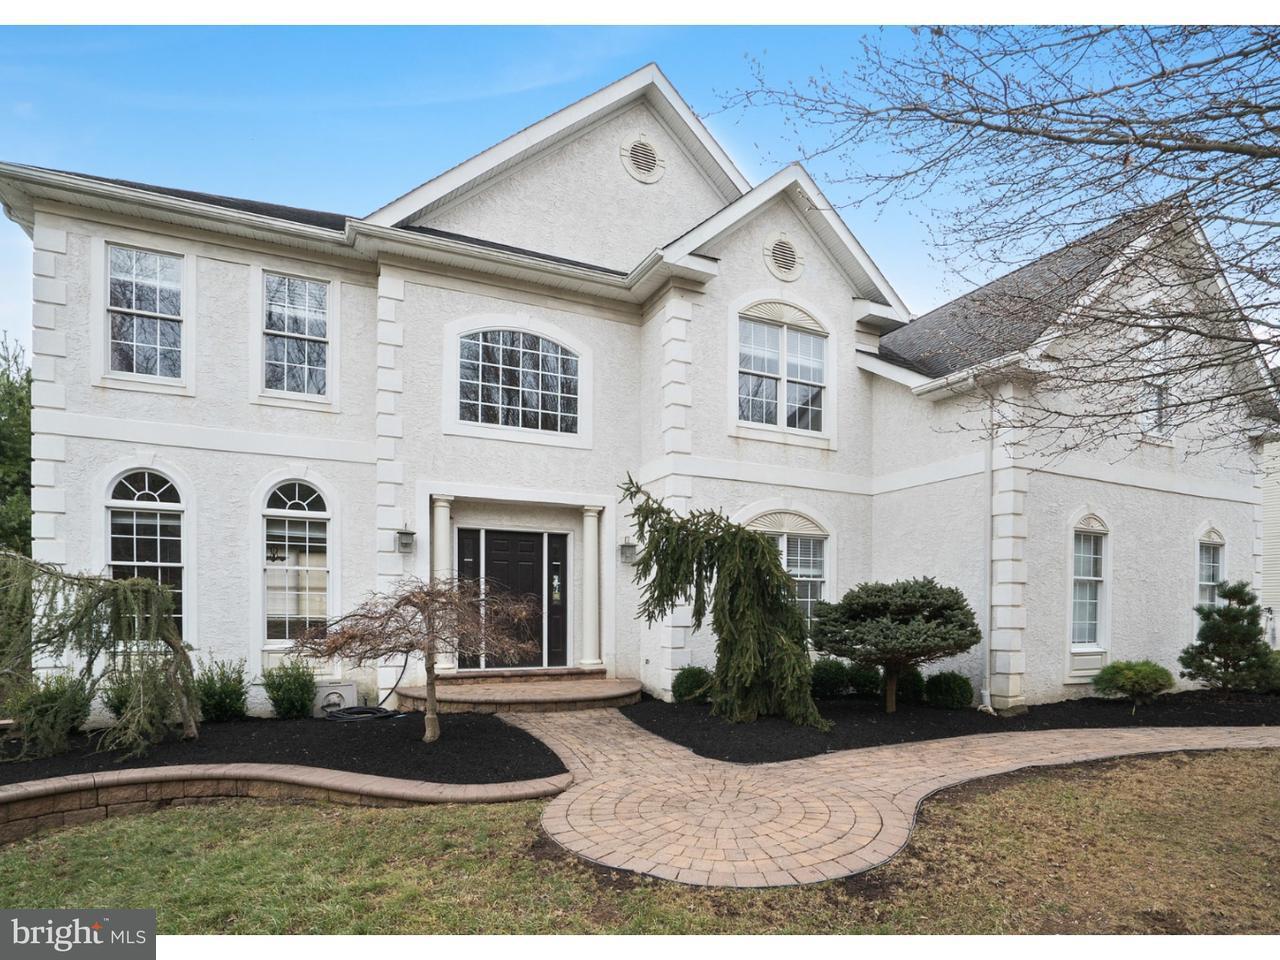 Single Family Home for Sale at 2617 CONDOR Circle Audubon, Pennsylvania 19403 United States